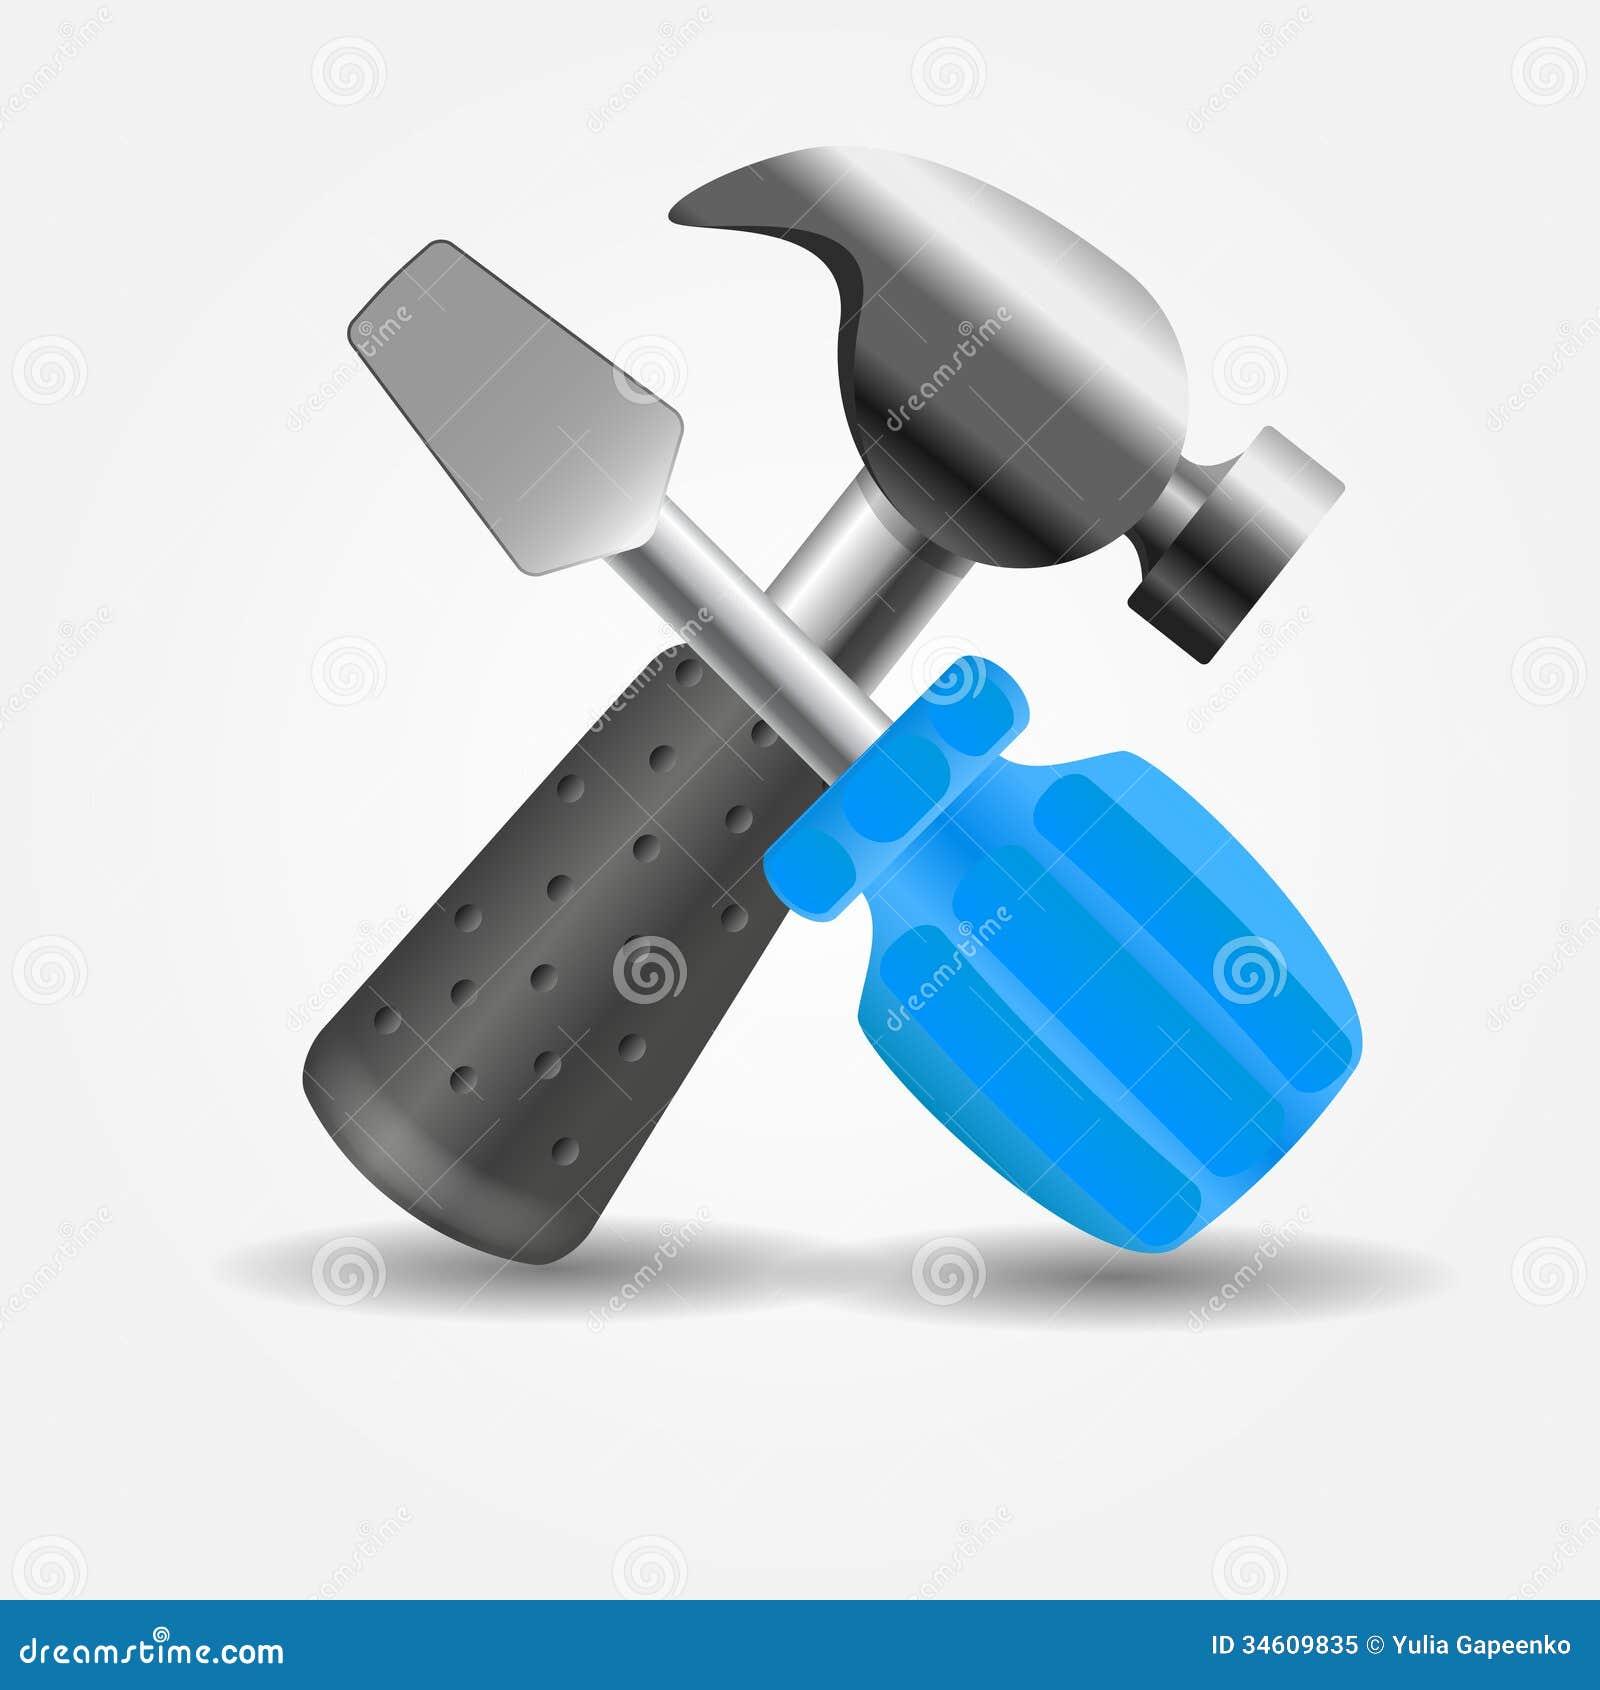 Vector Illustration Hammer: Screwdriver And Hammer Icon Vector Illustration Stock